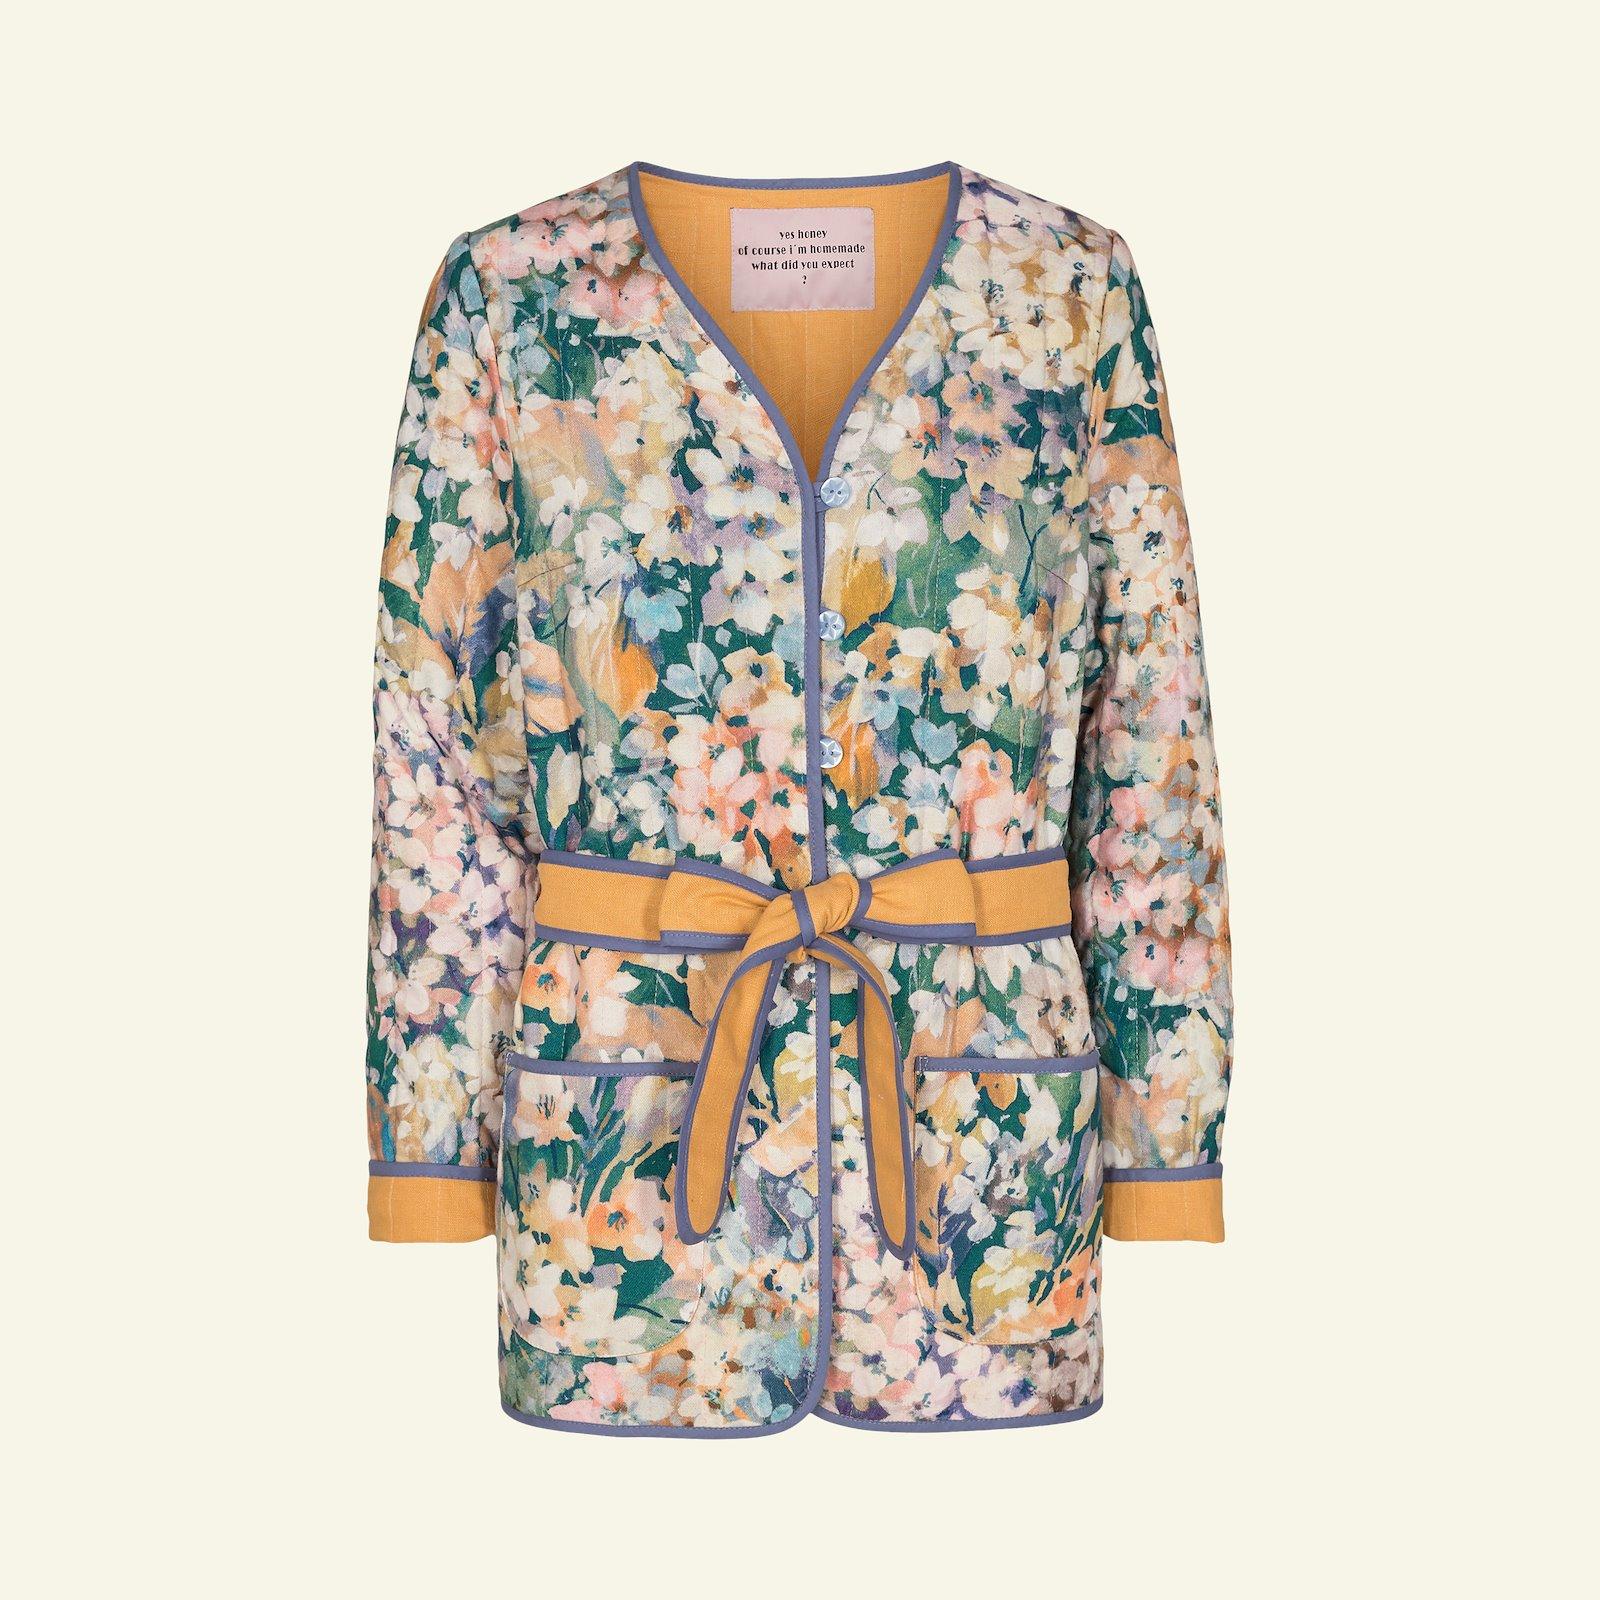 Linen/cotton warm curry p24047_750443_410137_66004_26541_33224_sskit